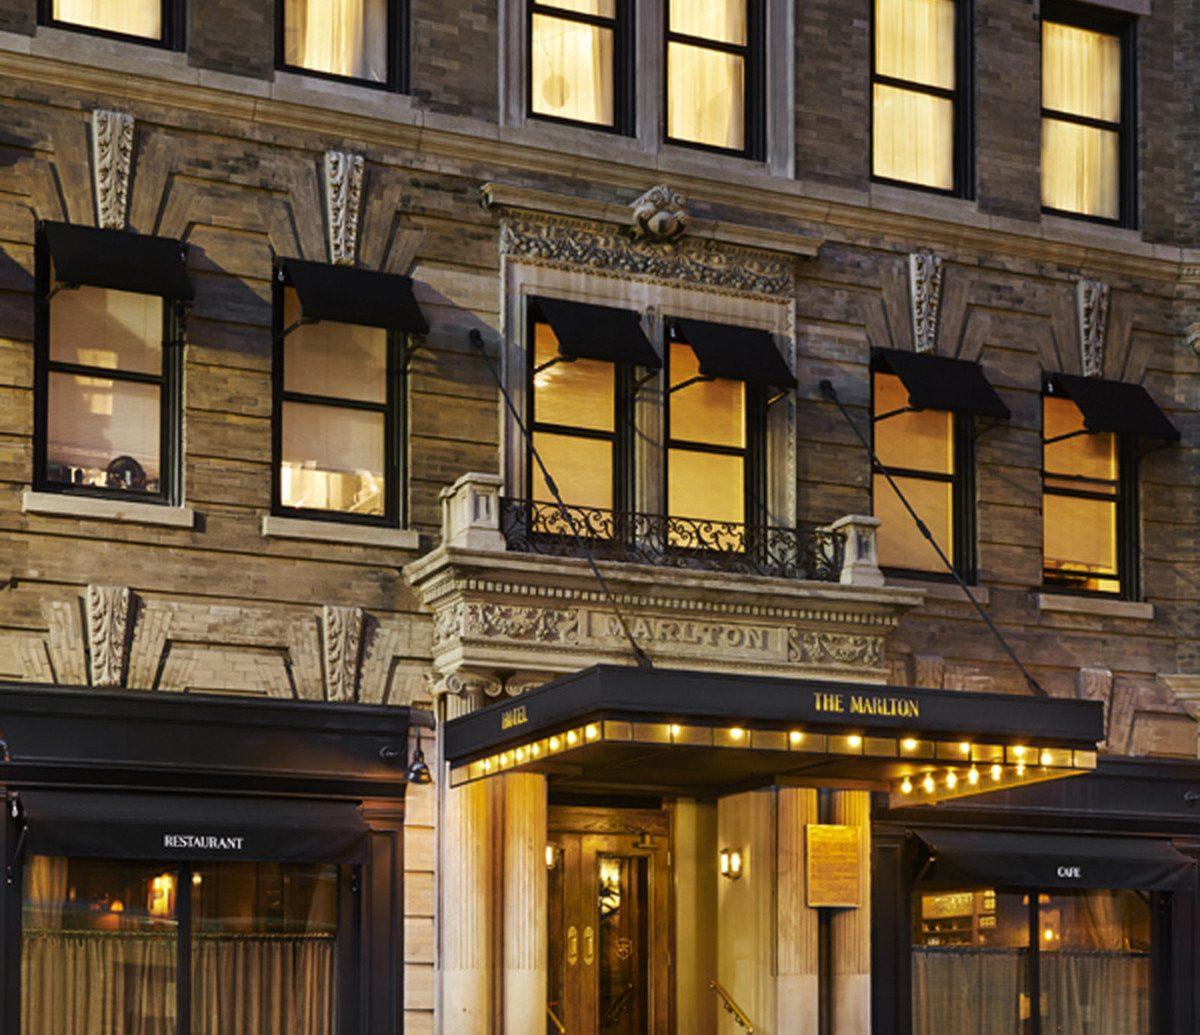 Hotels Luxury Travel Romantic Hotels building outdoor Architecture facade interior design home estate window City stone